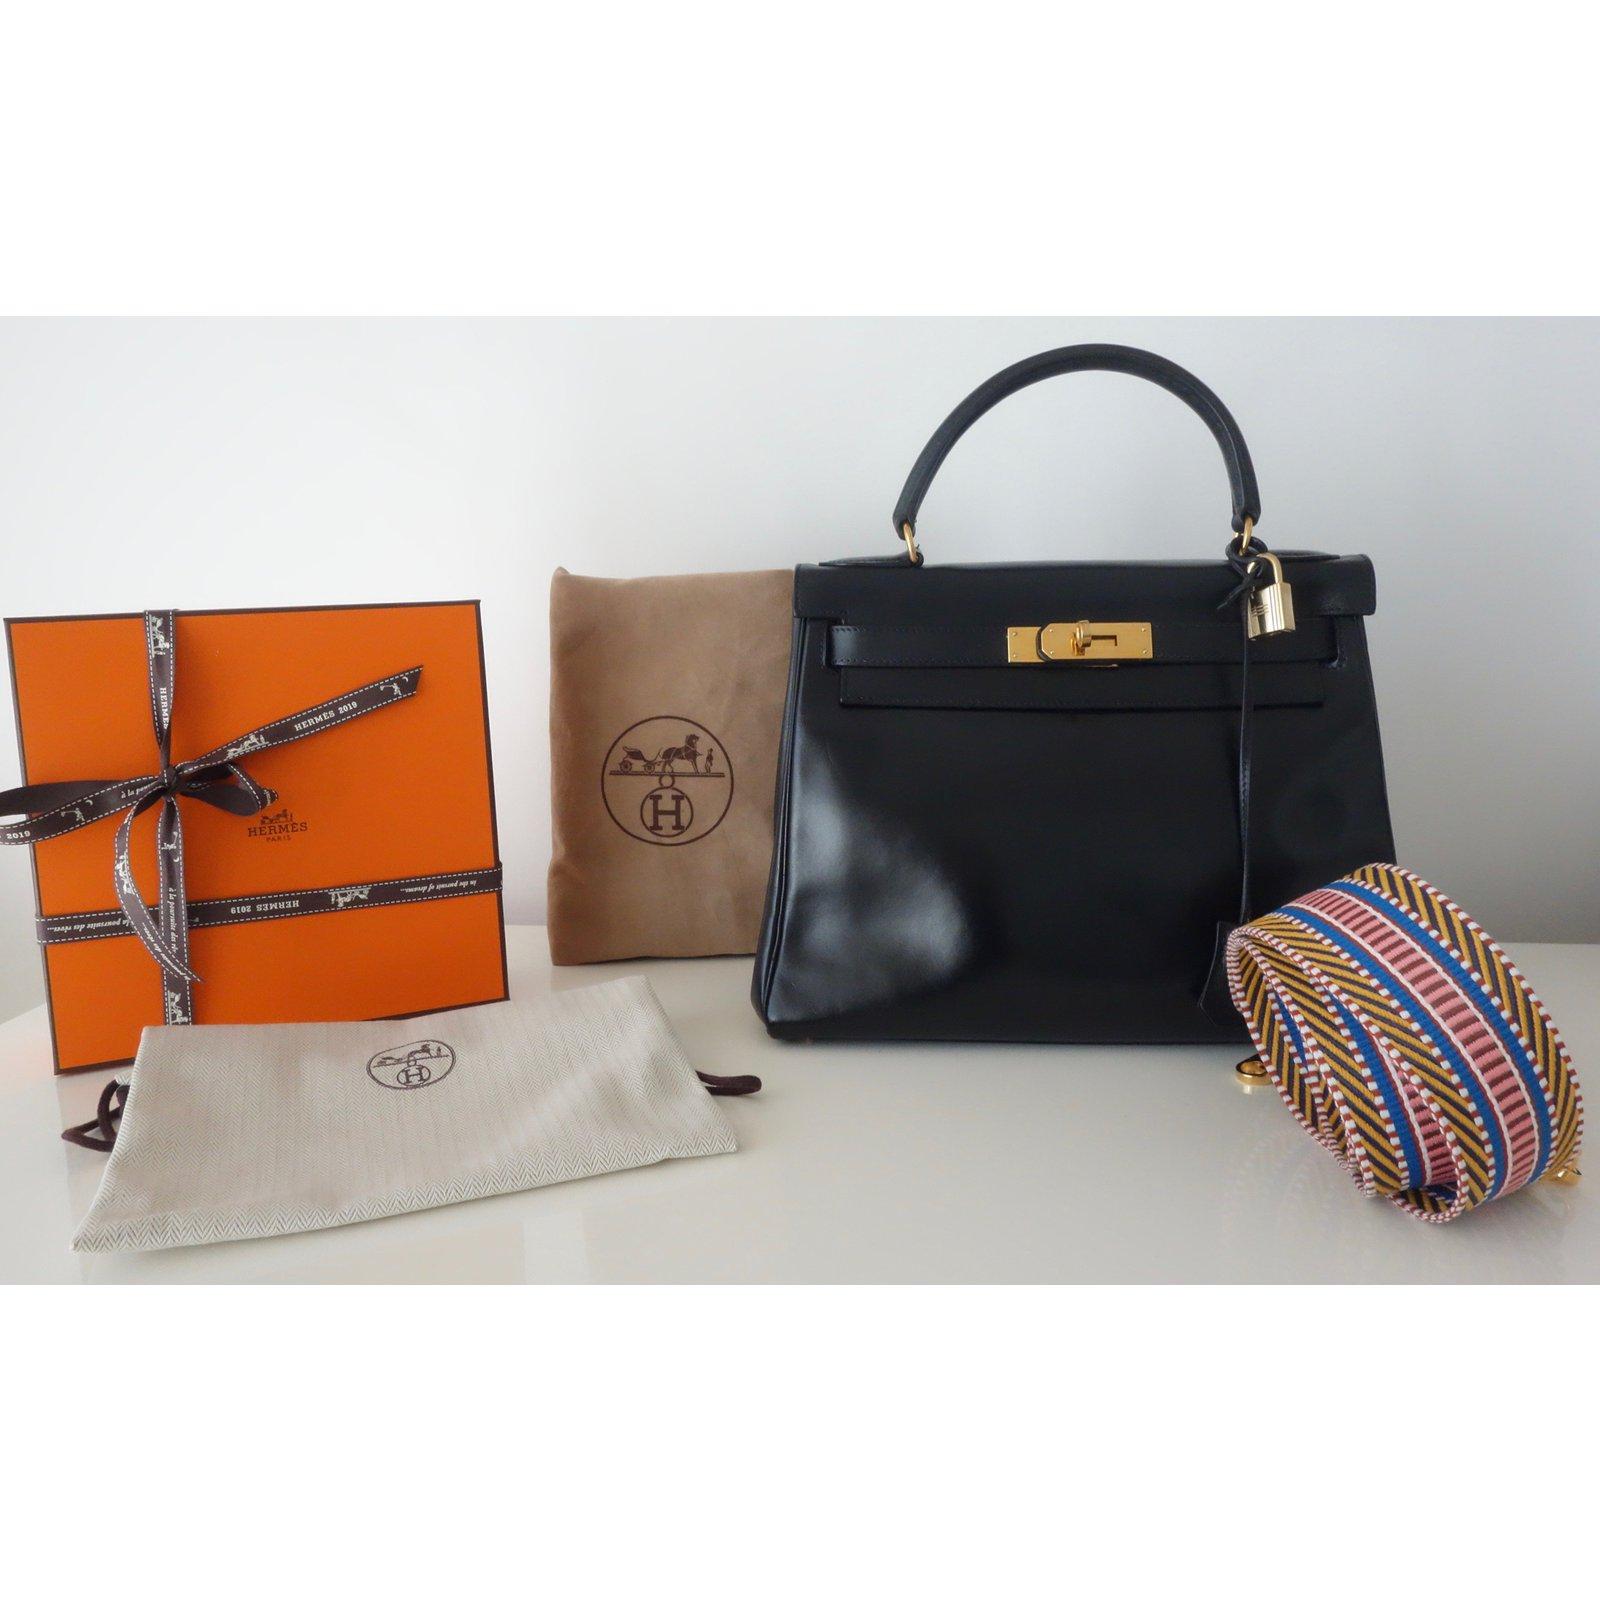 63c5426bd442 Hermès Vintage Hermes Kelly bag 28 Handbags Leather Black ref.108345 - Joli  Closet